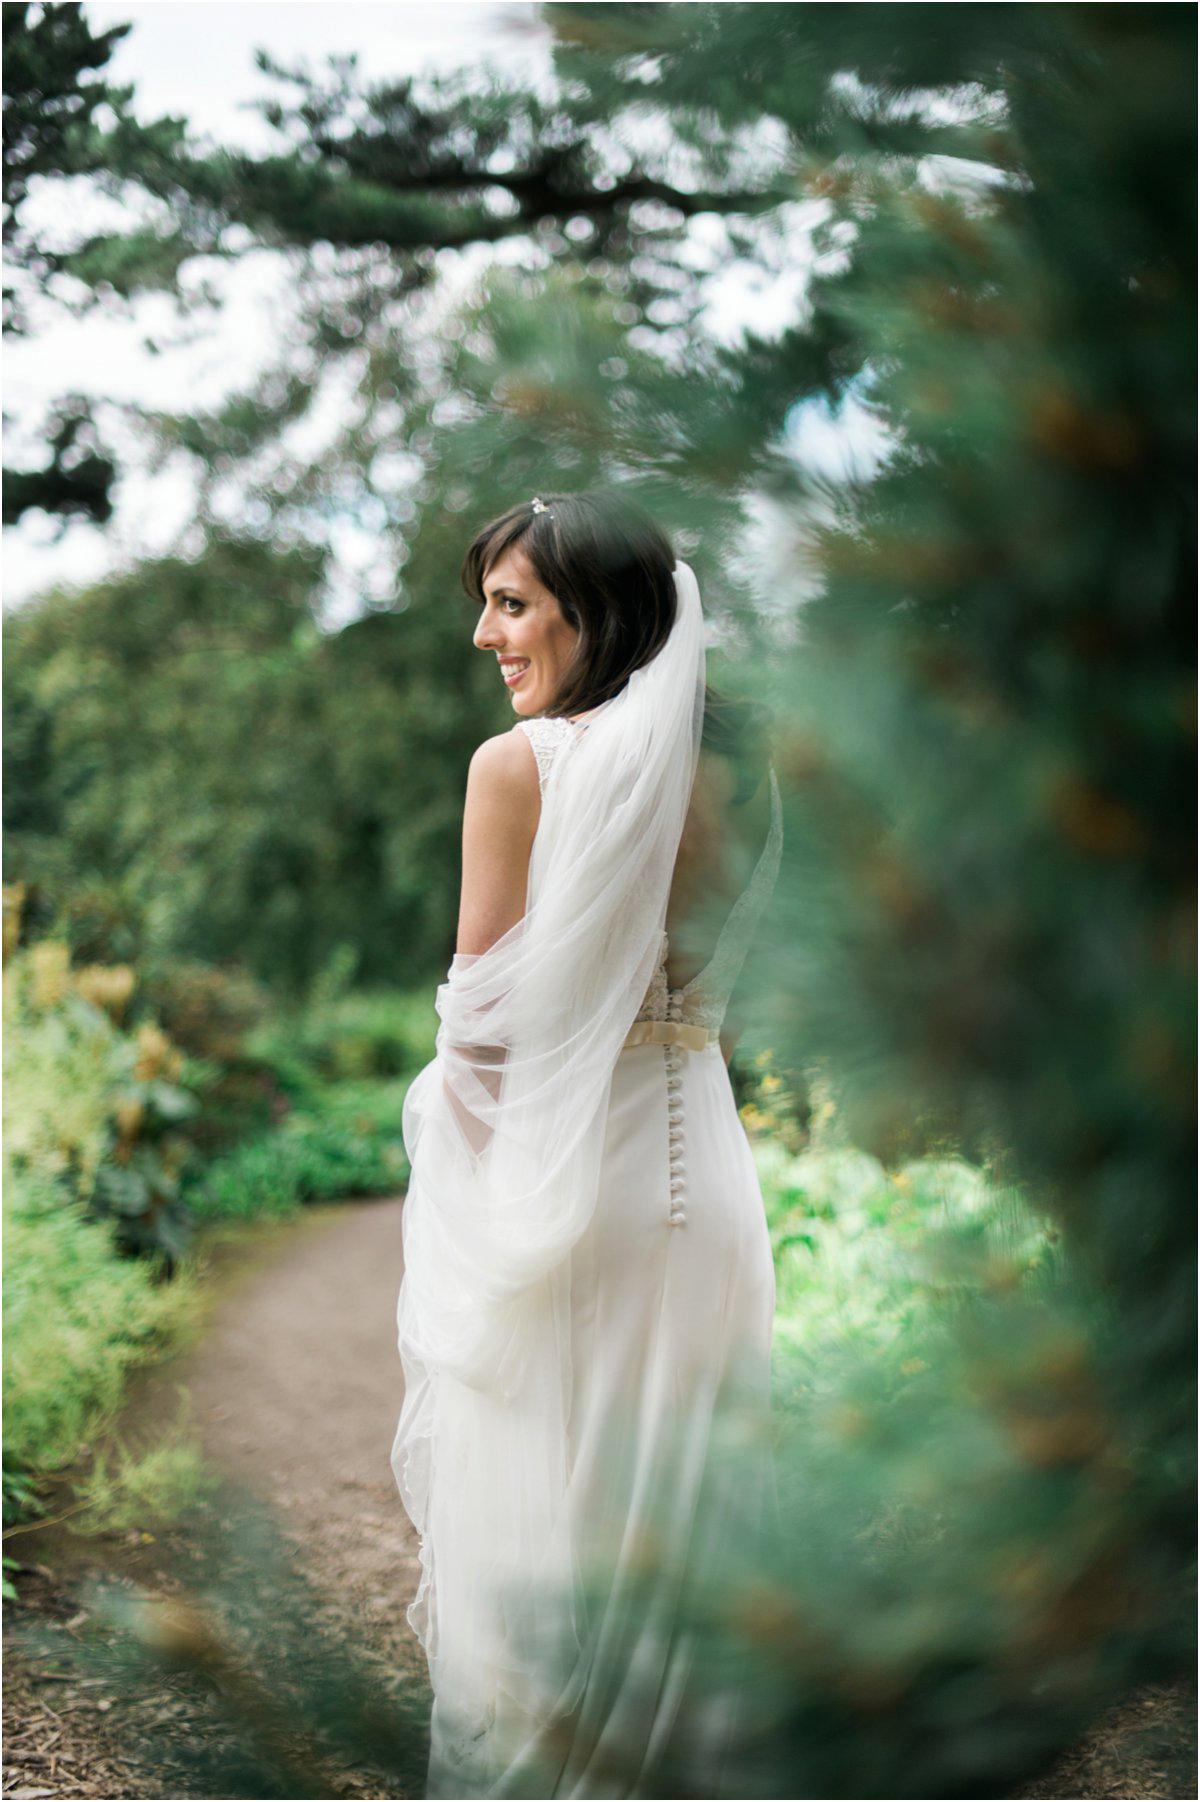 Crofts & Kowalczyk Best Wedding Photography Scotland Blogpost-144.jpg